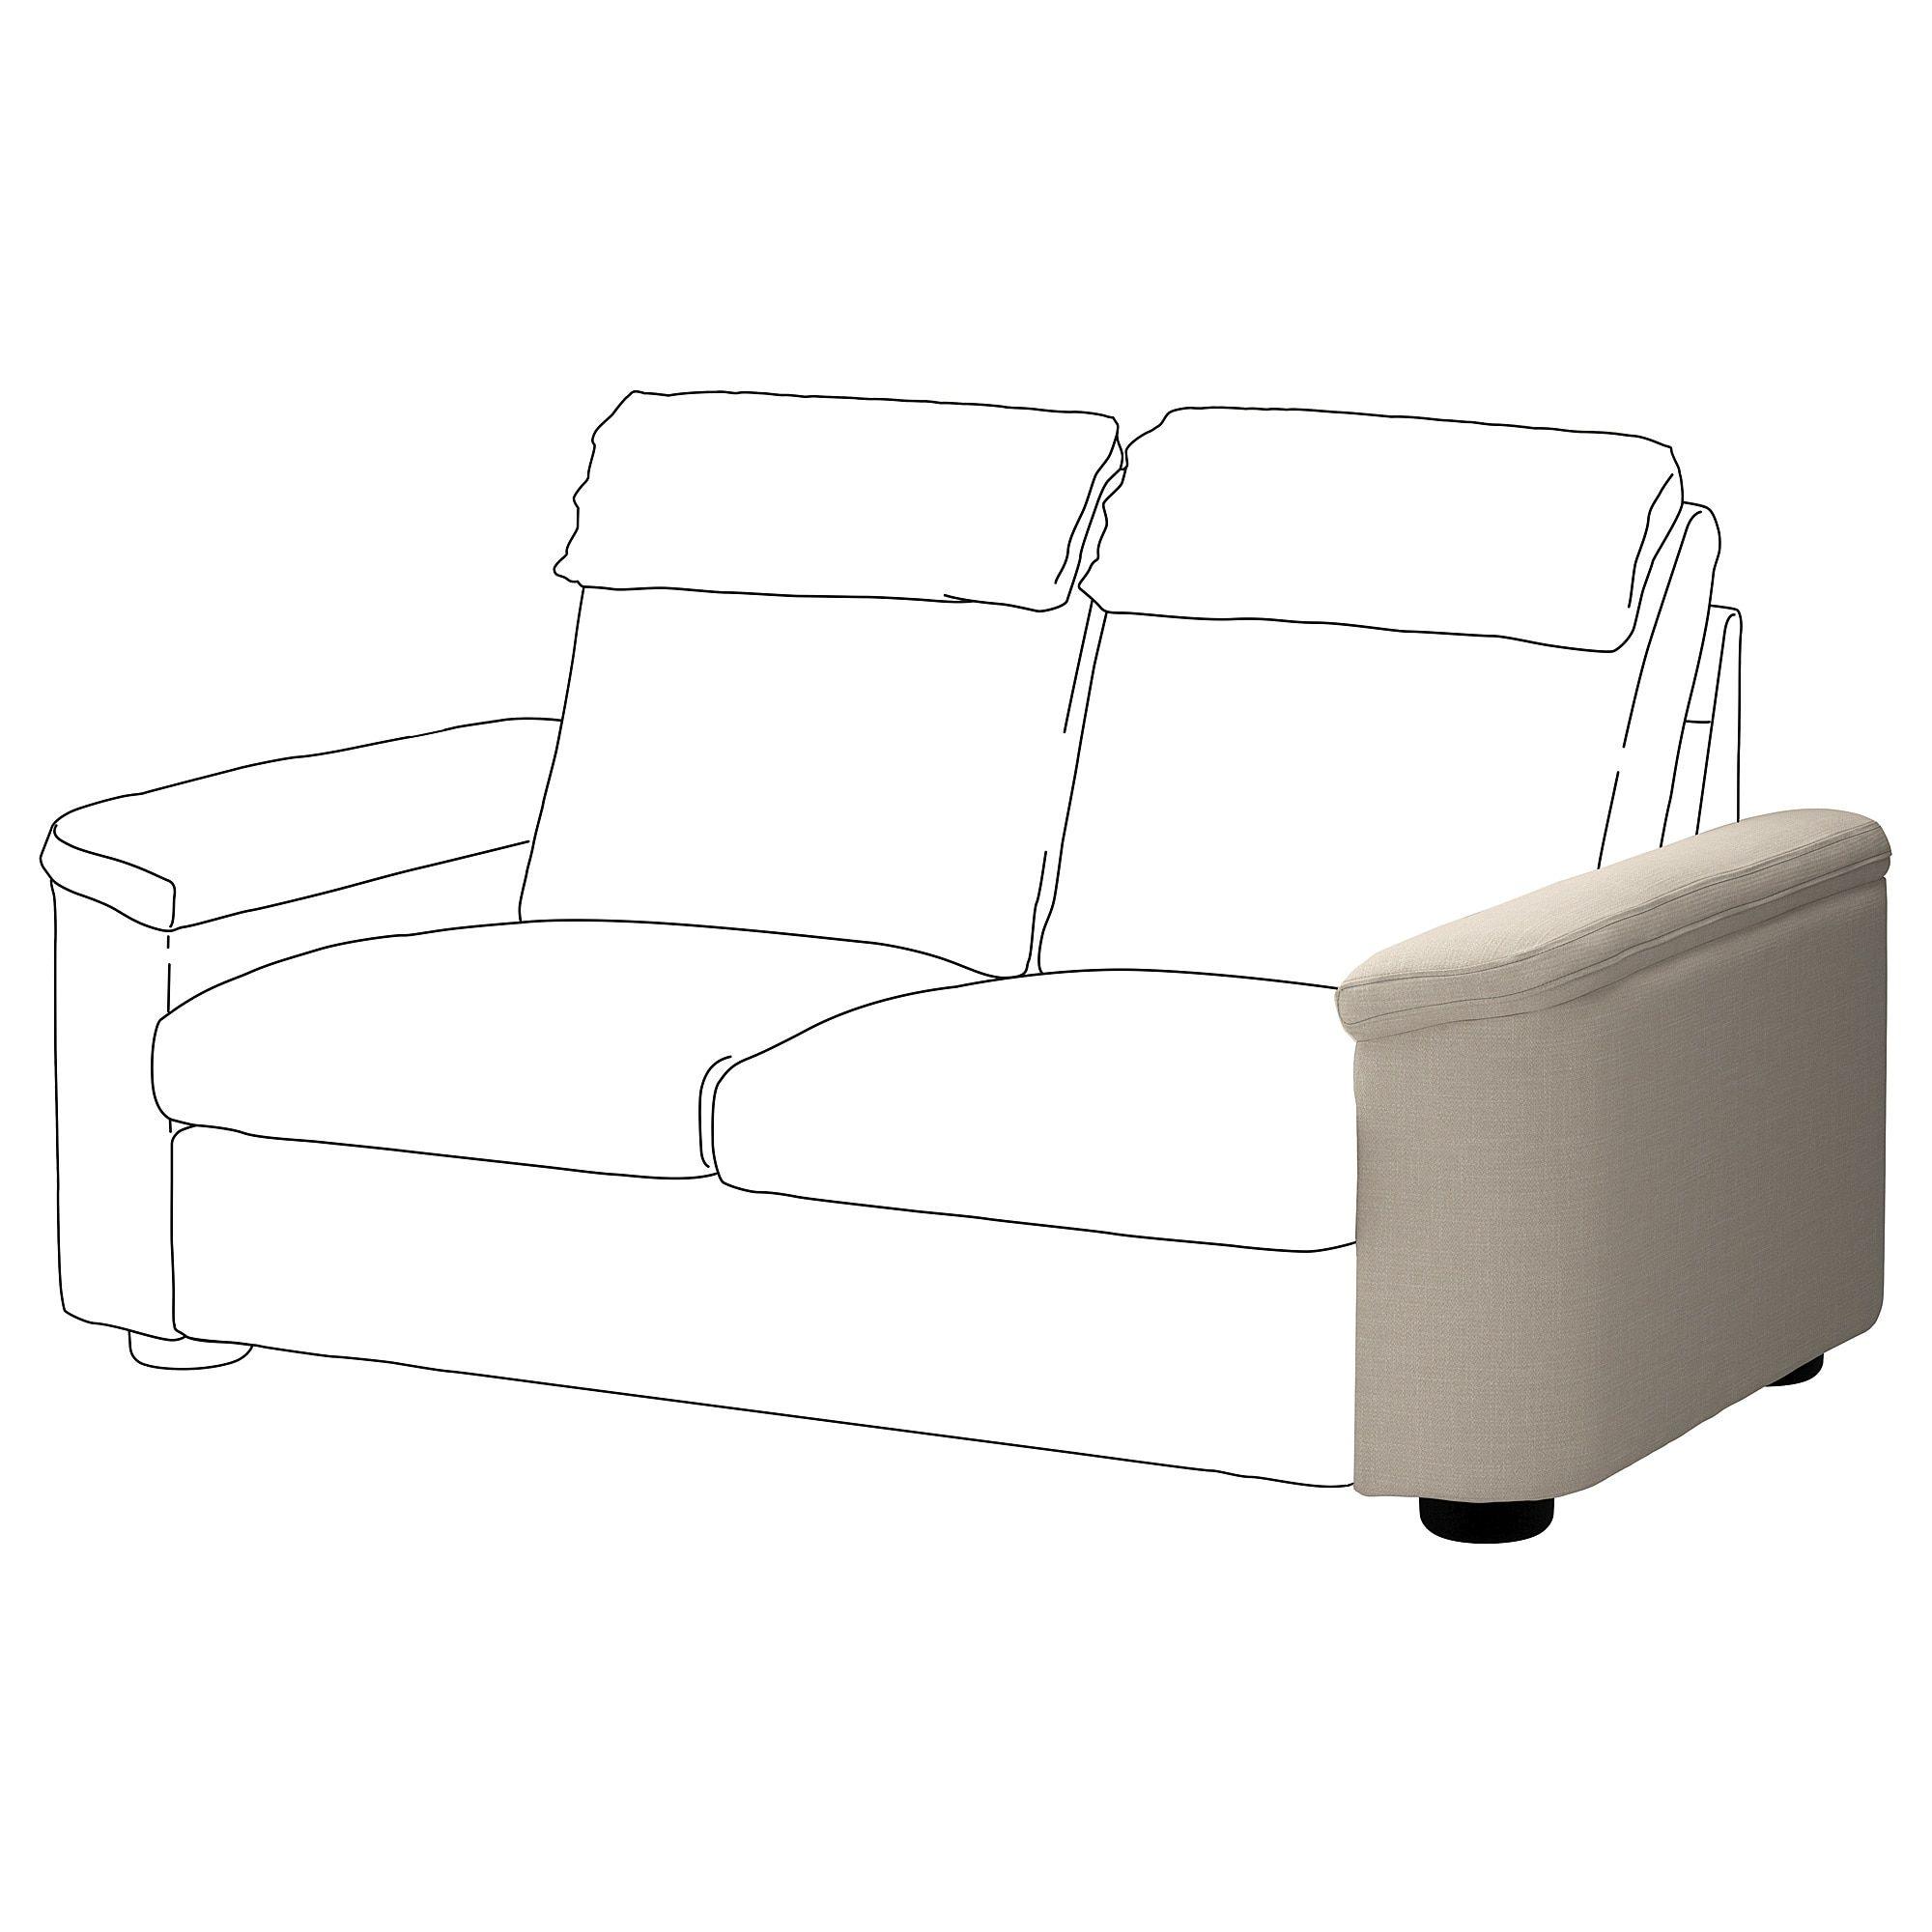 Us Furniture And Home Furnishings Modular Sofa Ikea Keep It